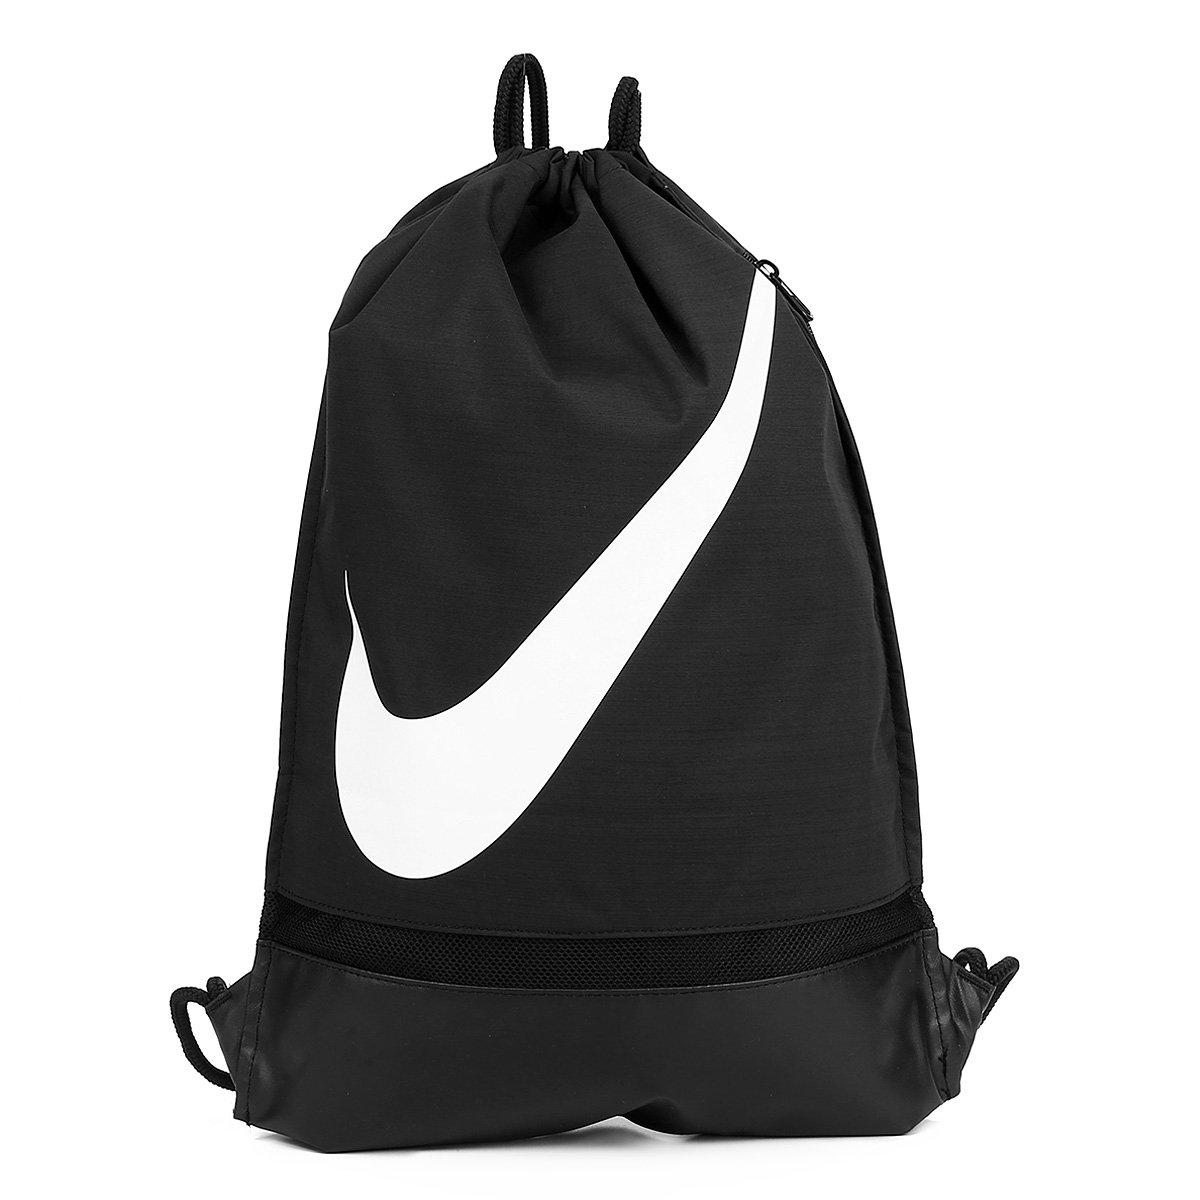 Academy Sack Preto Gym Nike Branco Sacola E 8NwXZPn0Ok